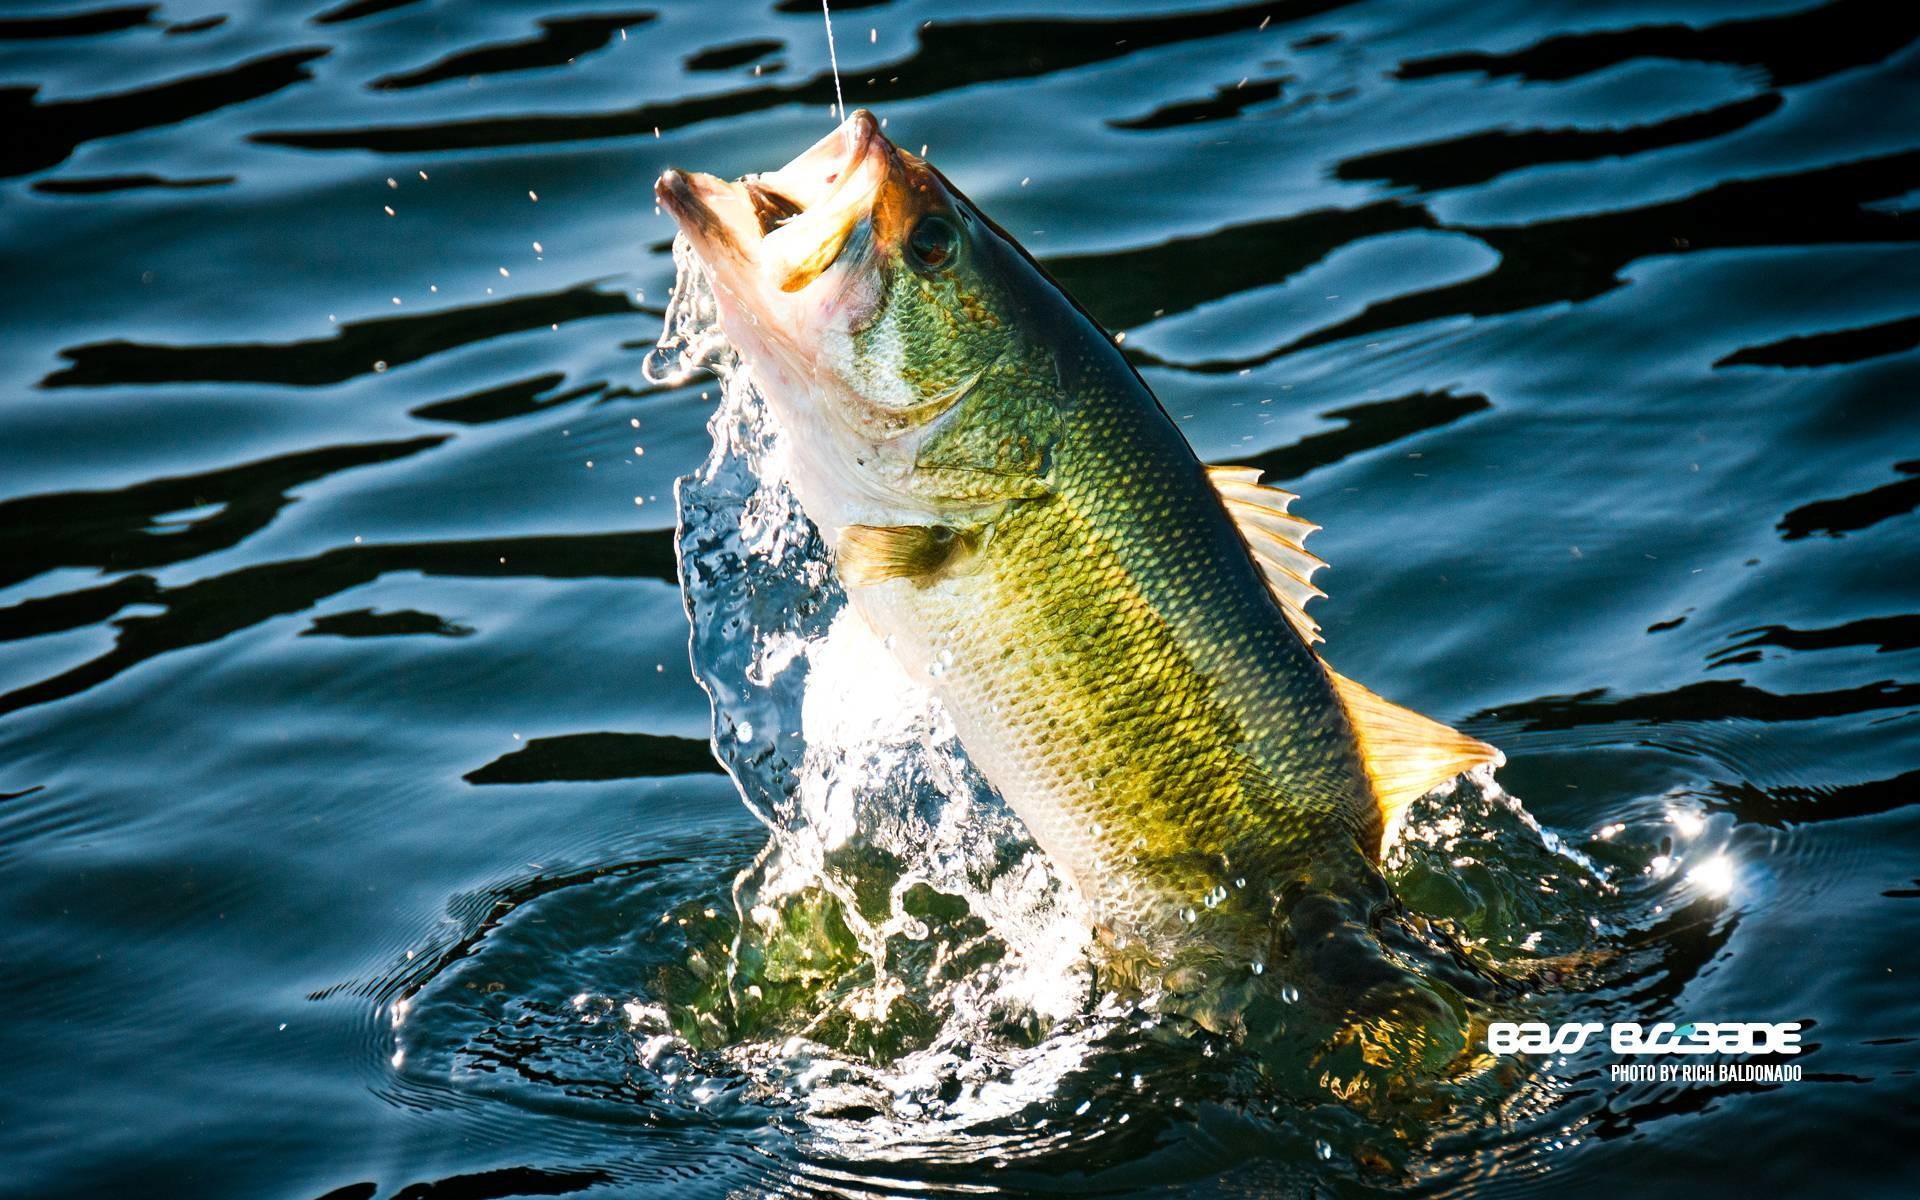 bass fishing wallpaper,fish,bass,water,fish,northern largemouth bass